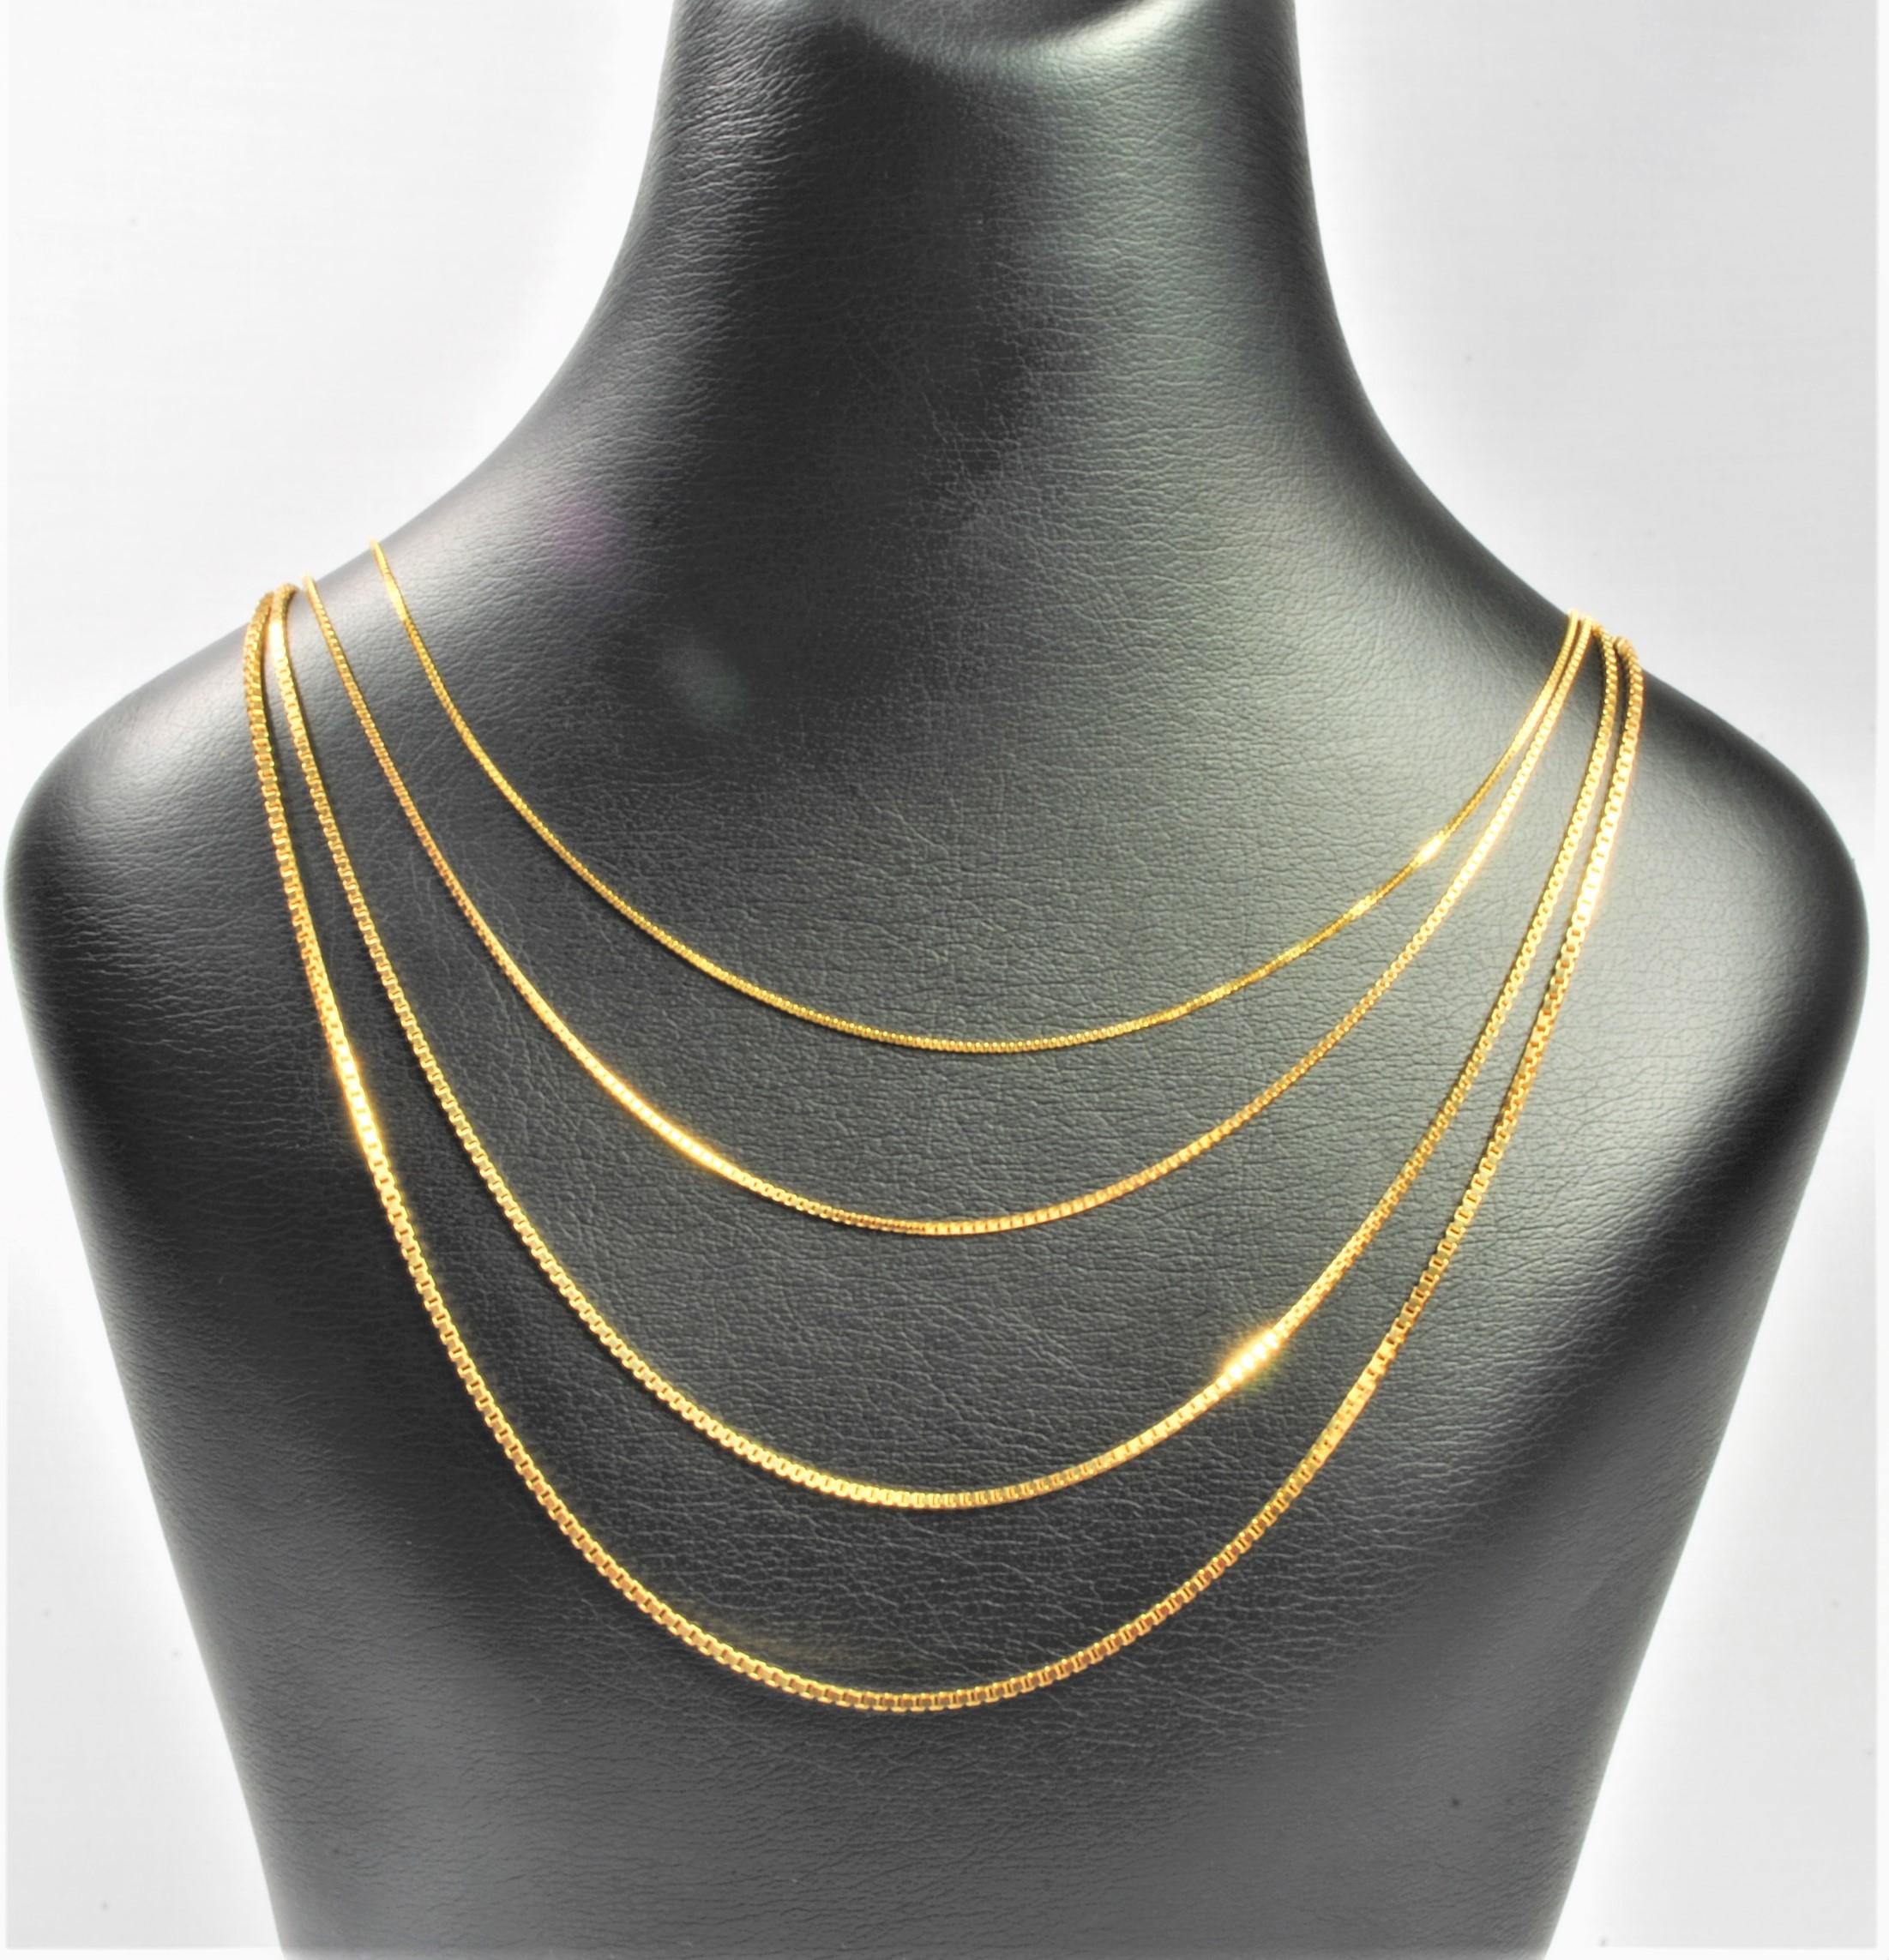 a0b3980c01d 14 kt Guld venezia halskæde 80 cm - Ure-smykker din lokale urmager ...